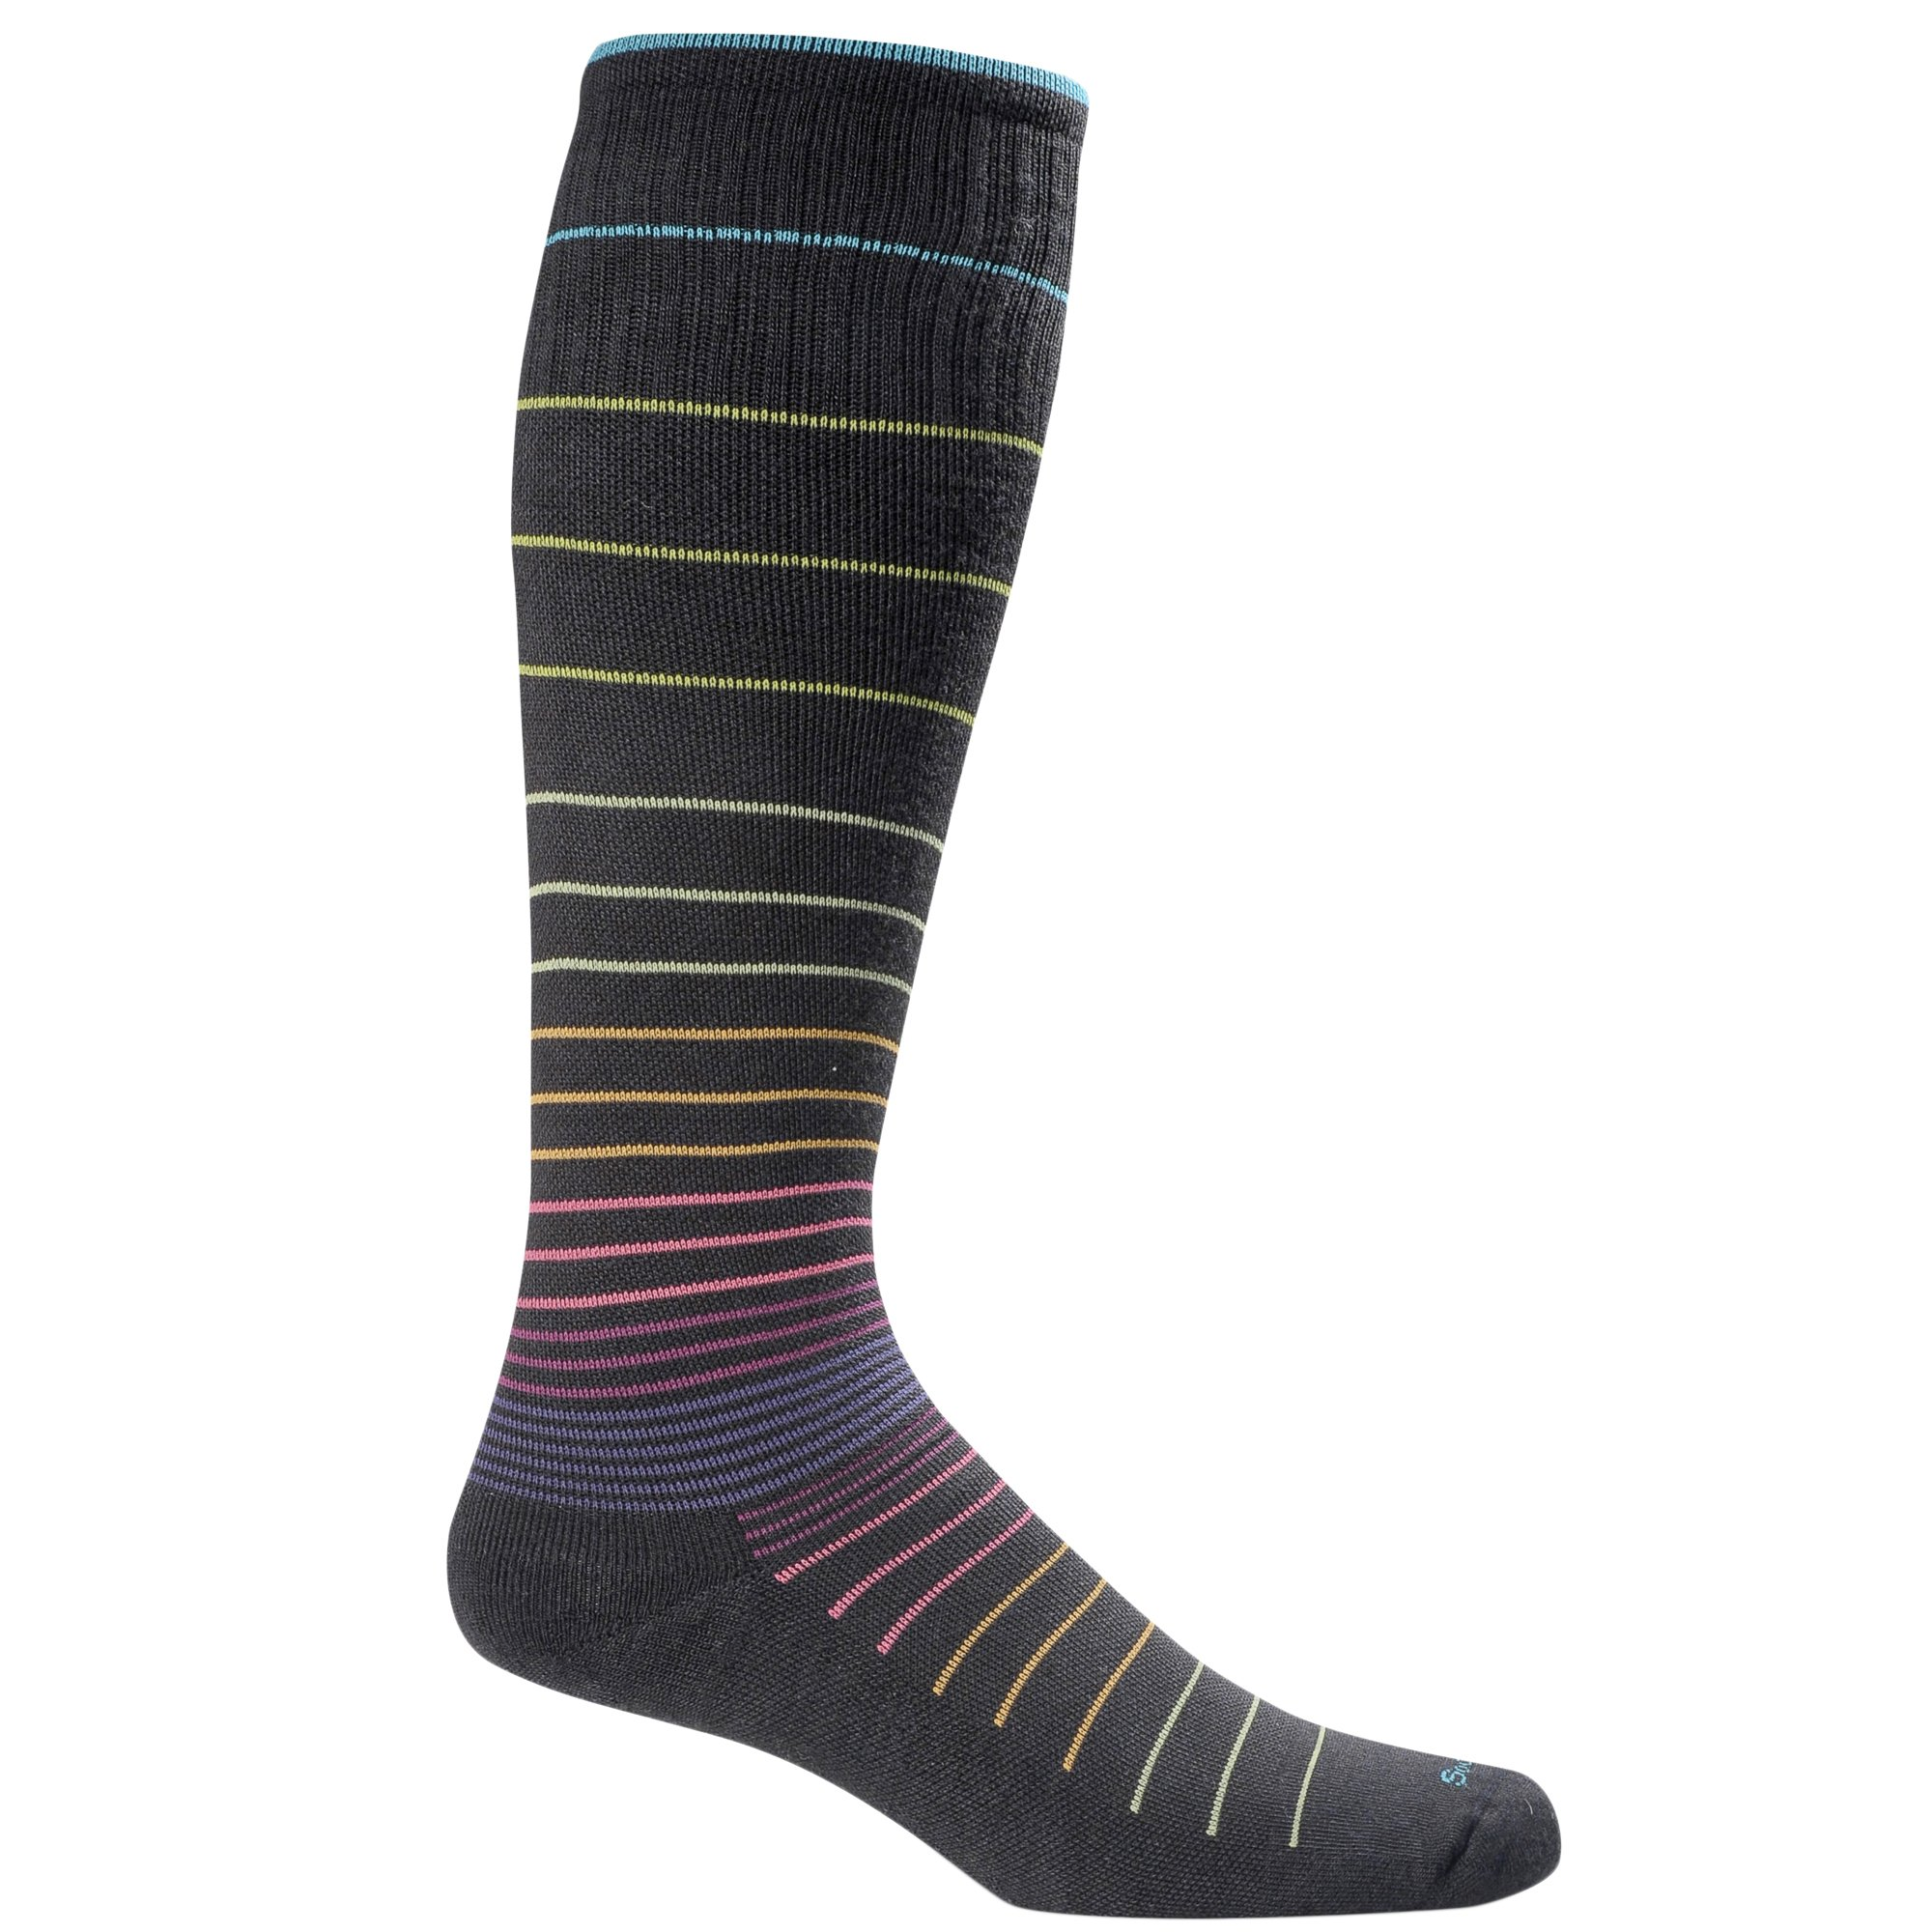 Sockwell Women's Circulator Graduated Compression Socks-Ideal for-Travel-Sports-Nurses-Reduces Swelling, Medium/Large(8-11), Black Stripe